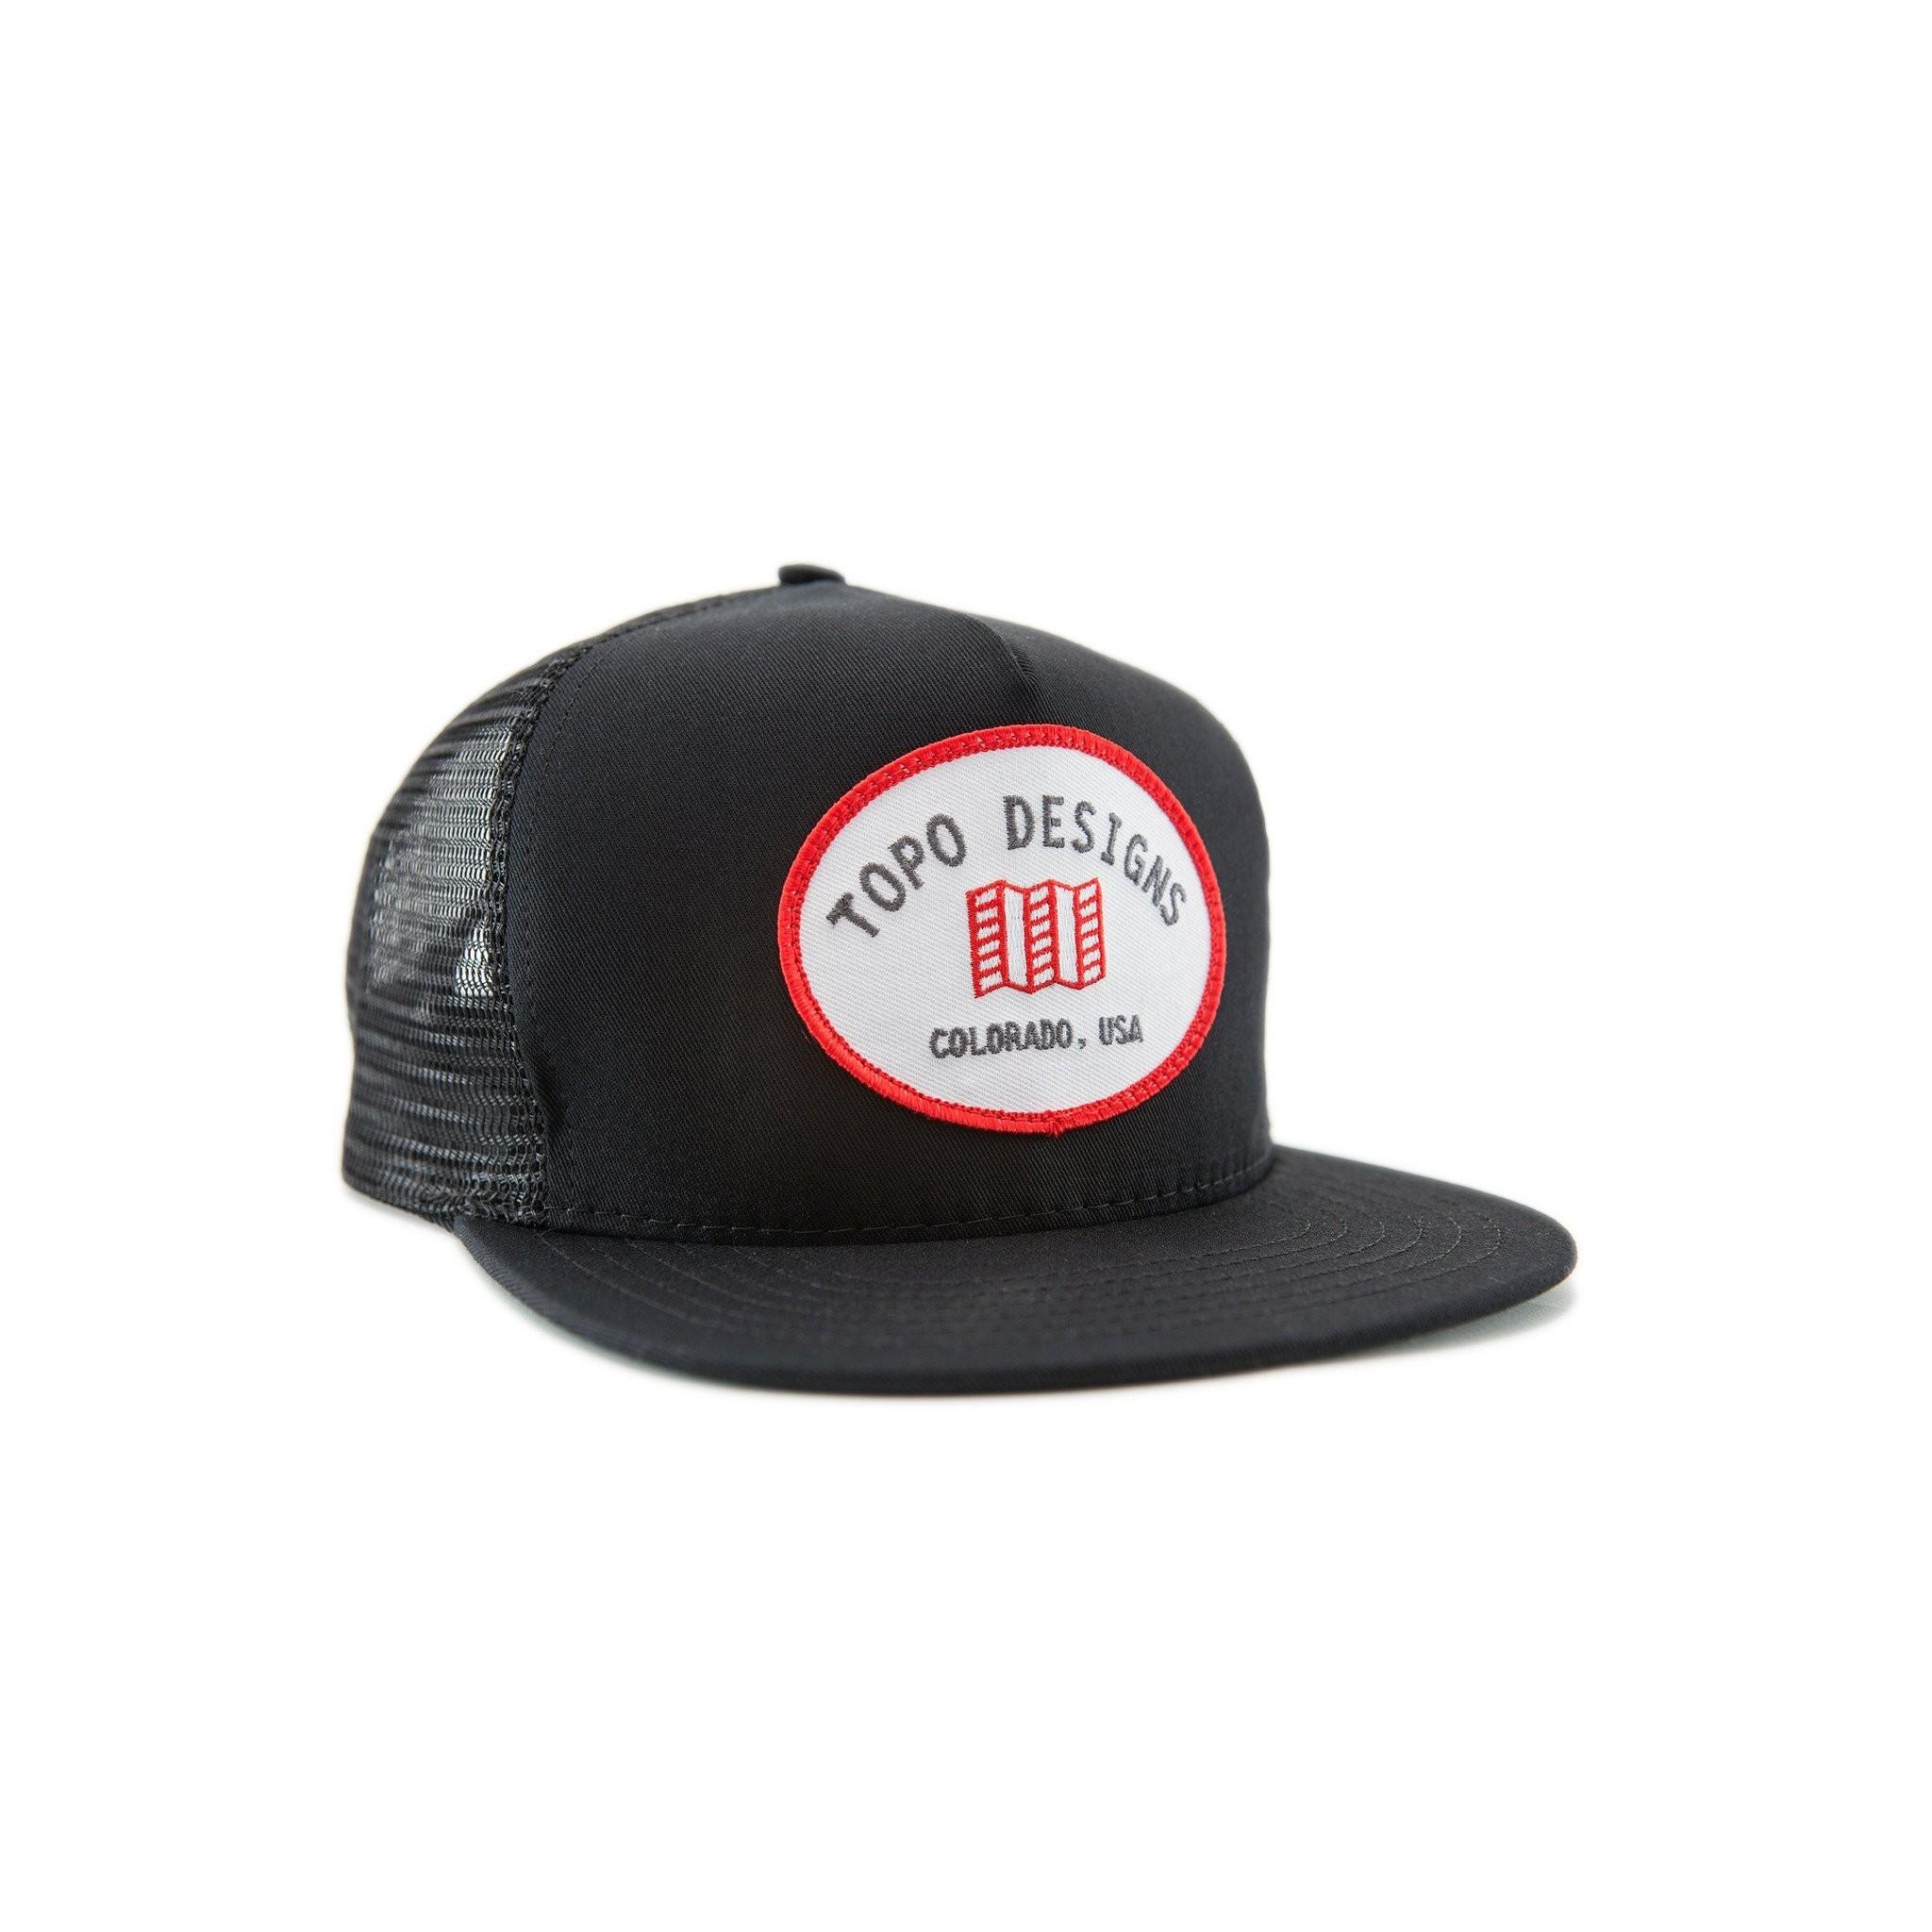 Topo Designs Snapback Hat : Black